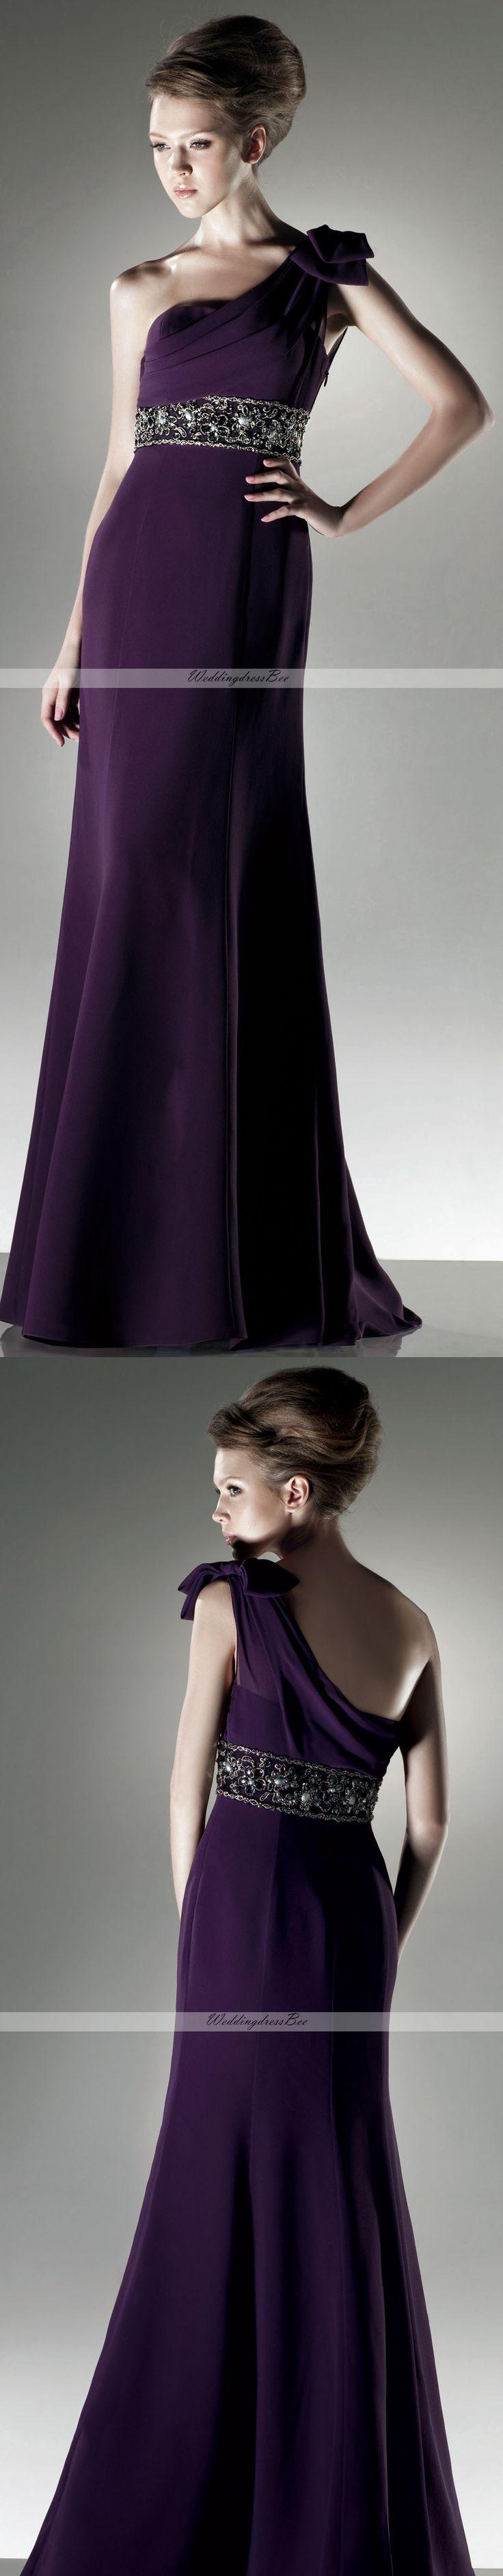 Modern One shoulder A-line chiffon dress...Mardi Gras Ball!